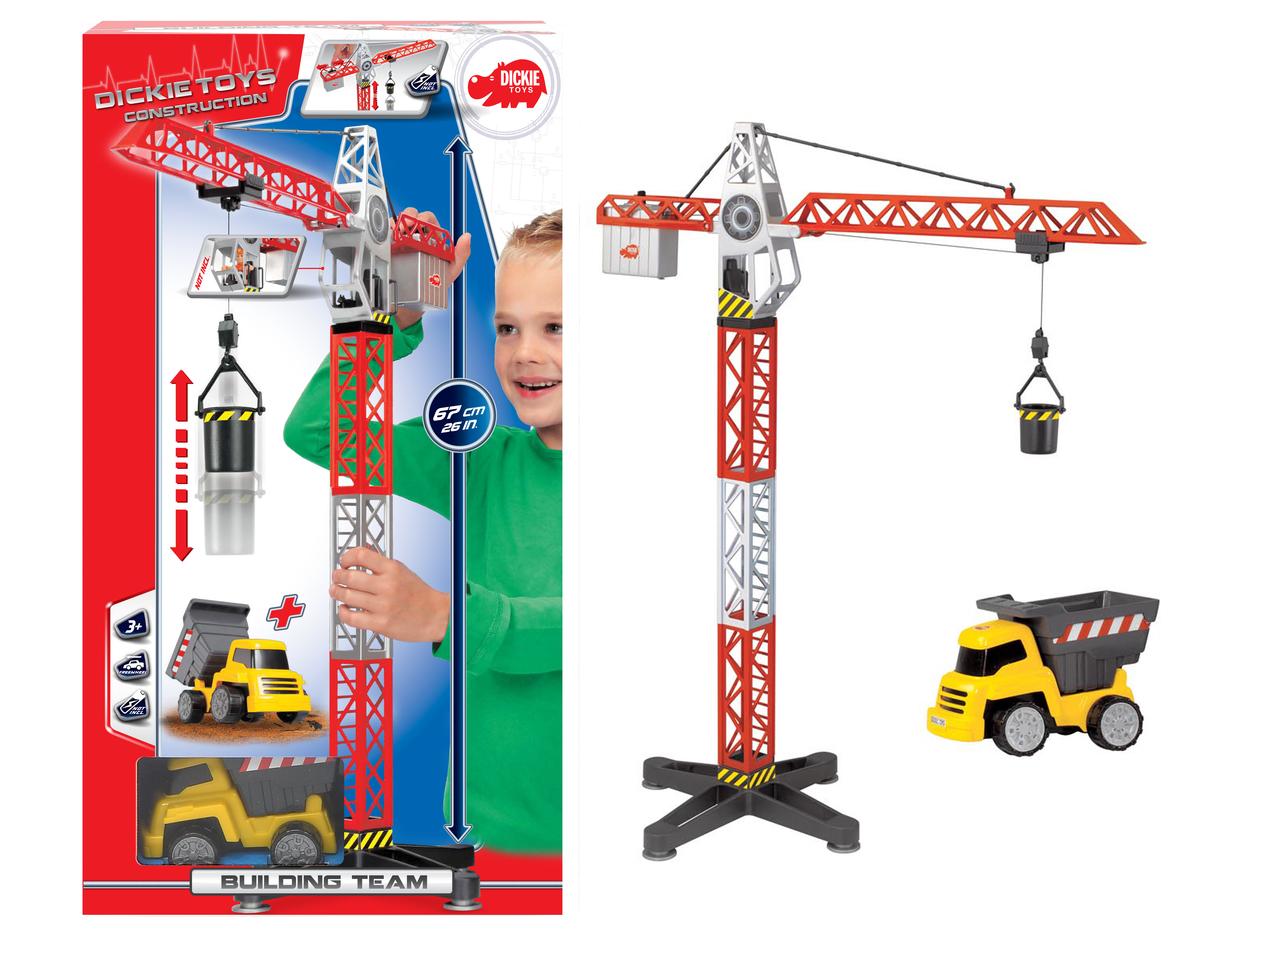 Construction Kran mit Baufahrzeug